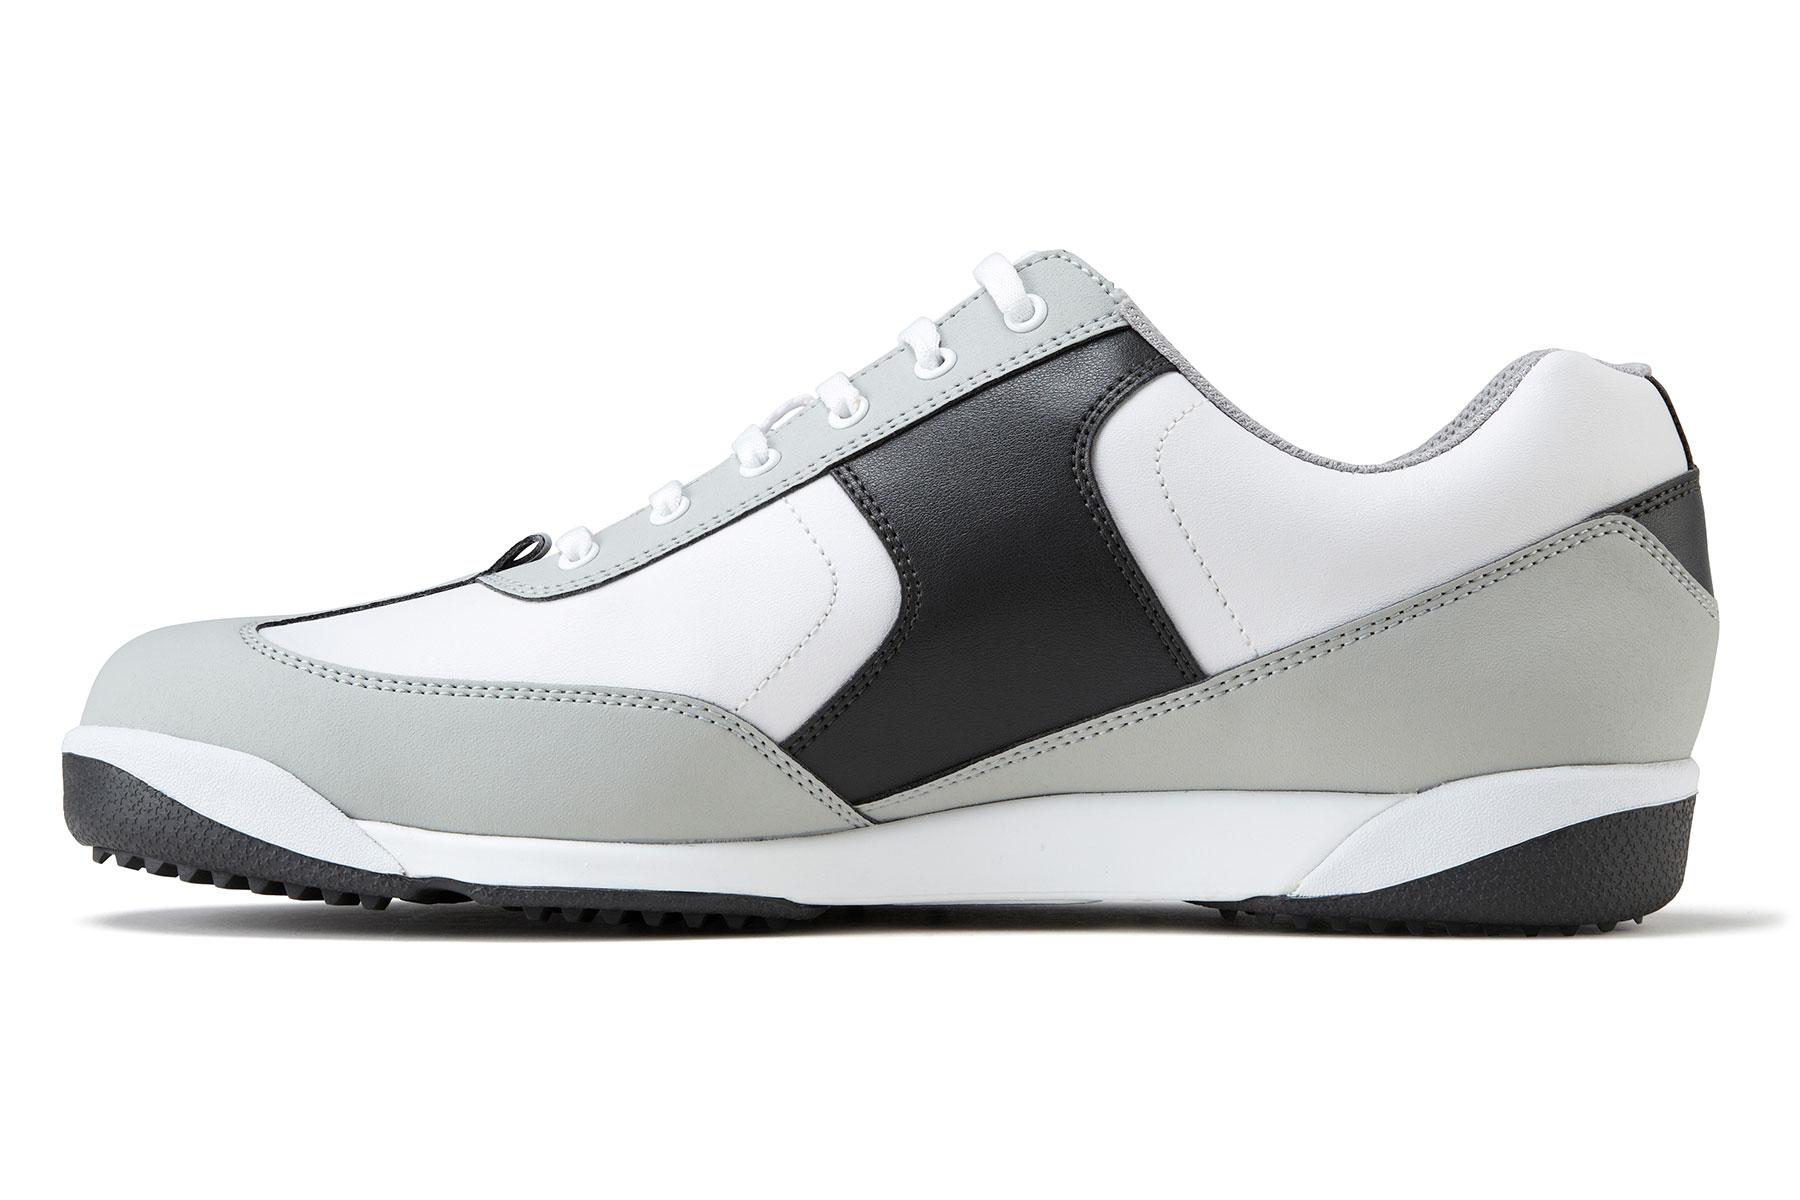 footjoy awd xl casual shoes golf